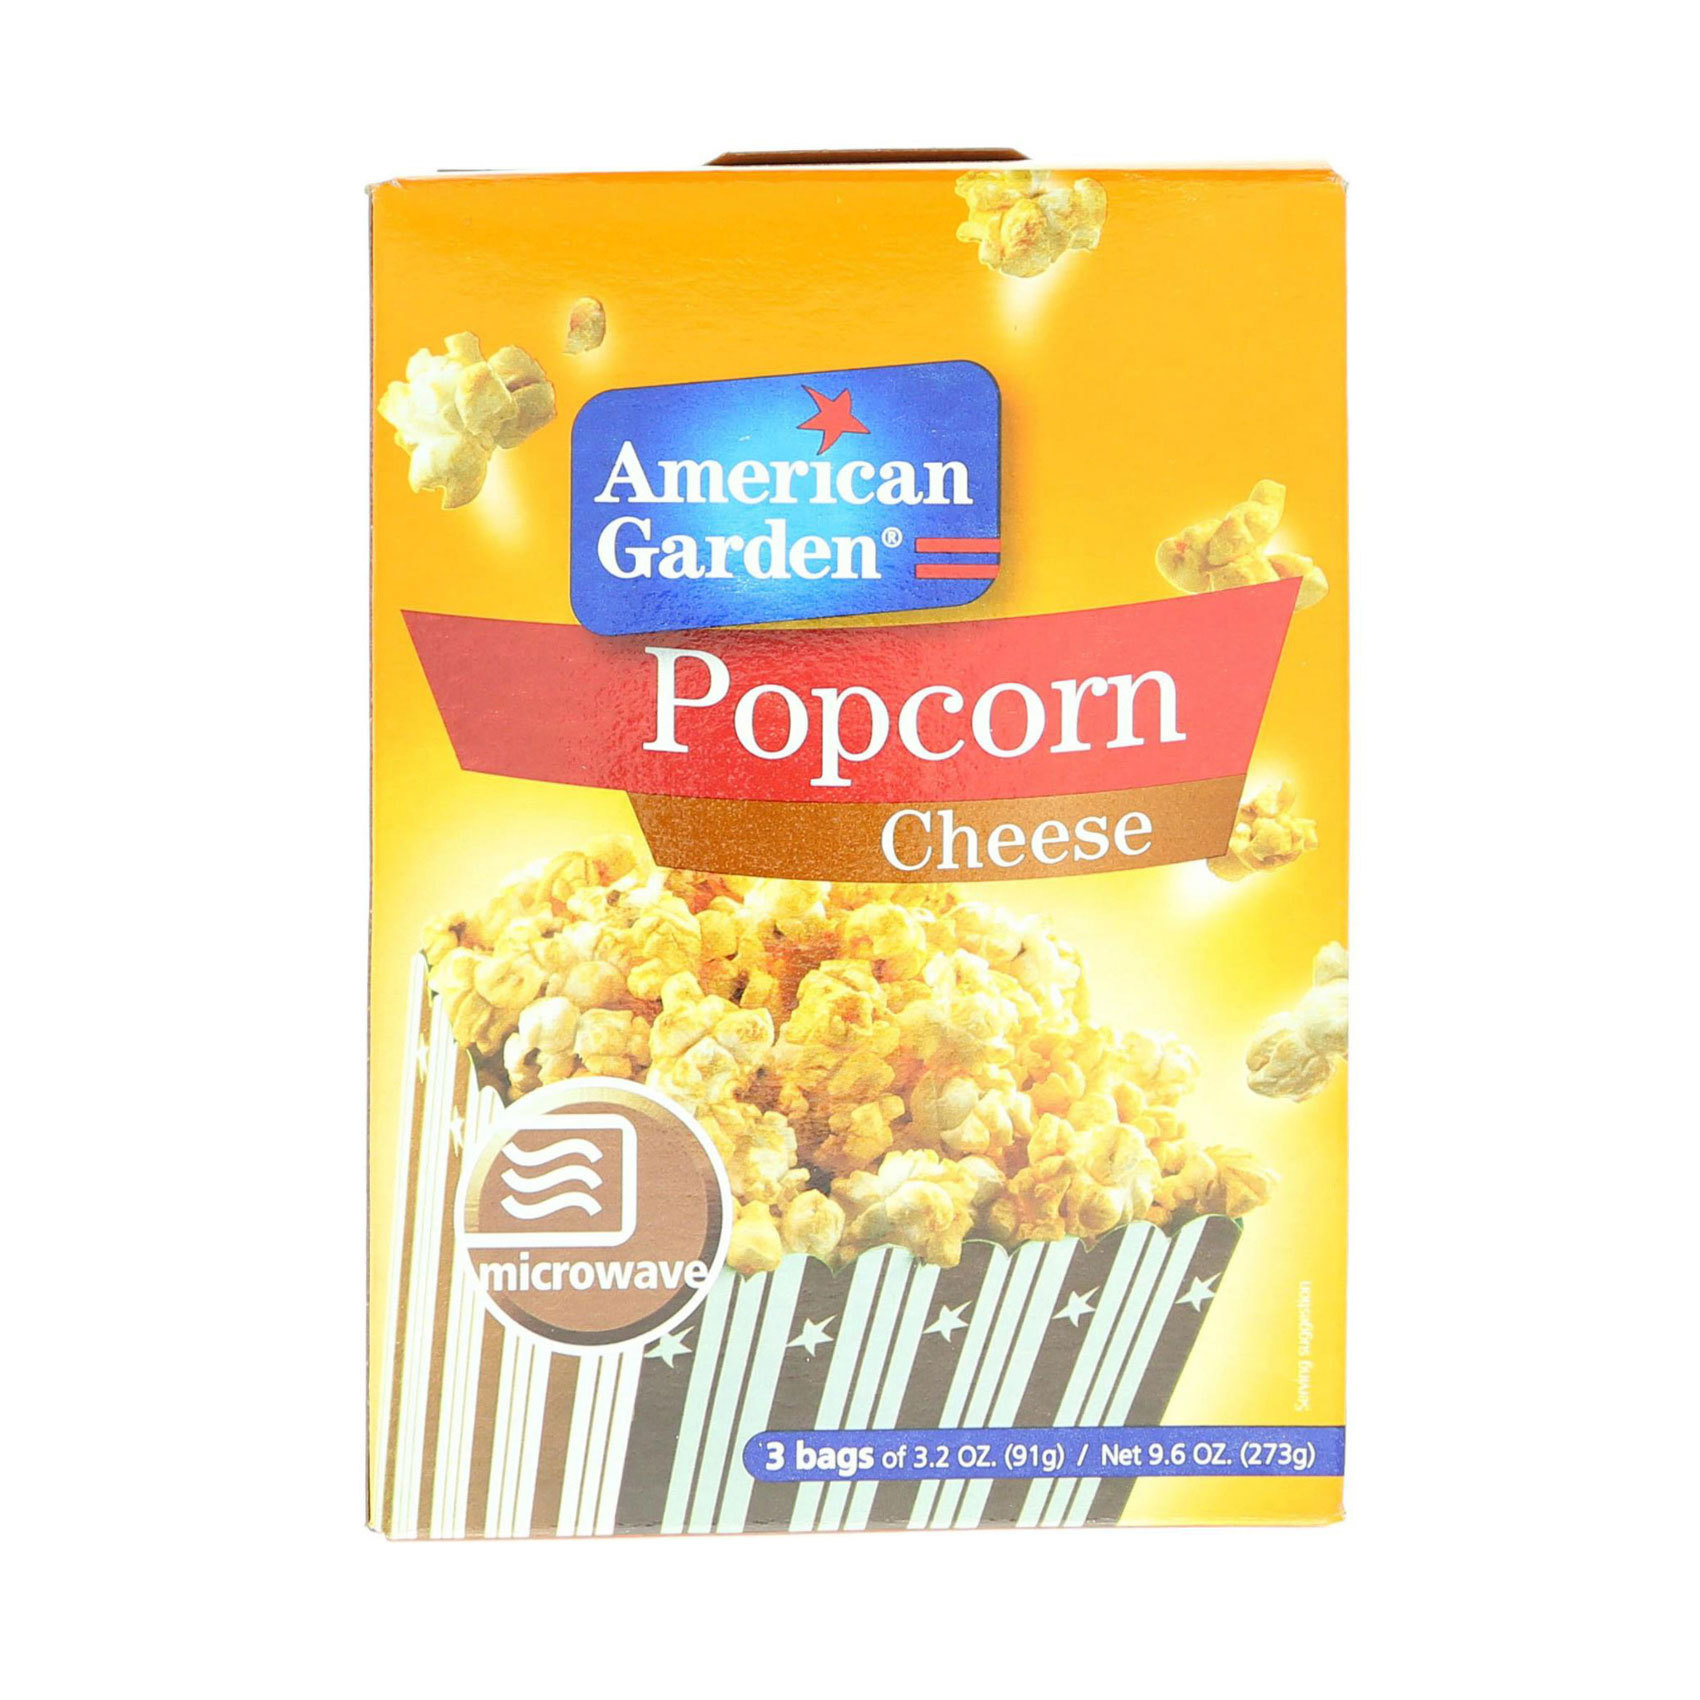 AMERICAN G. POPCORN CHEESE 273G